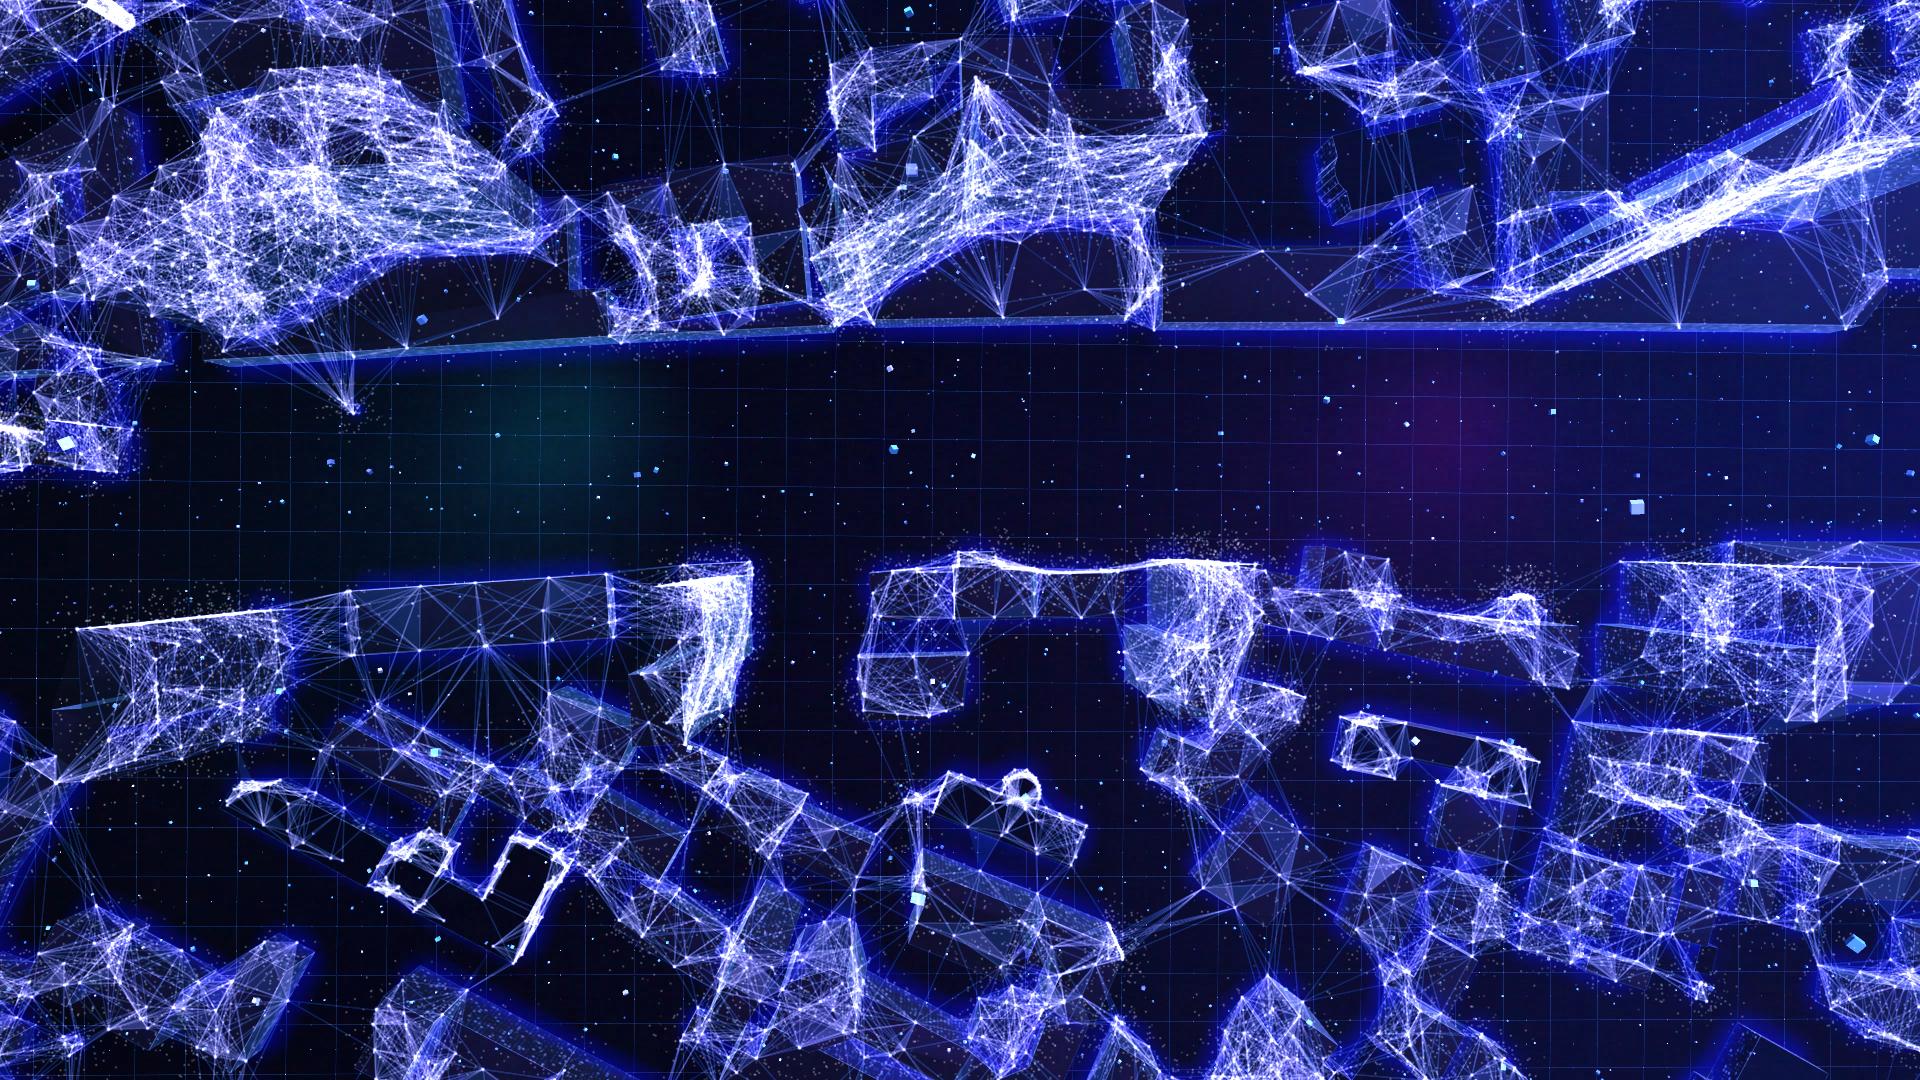 Кадр из 3d-анимации, моушен-графика